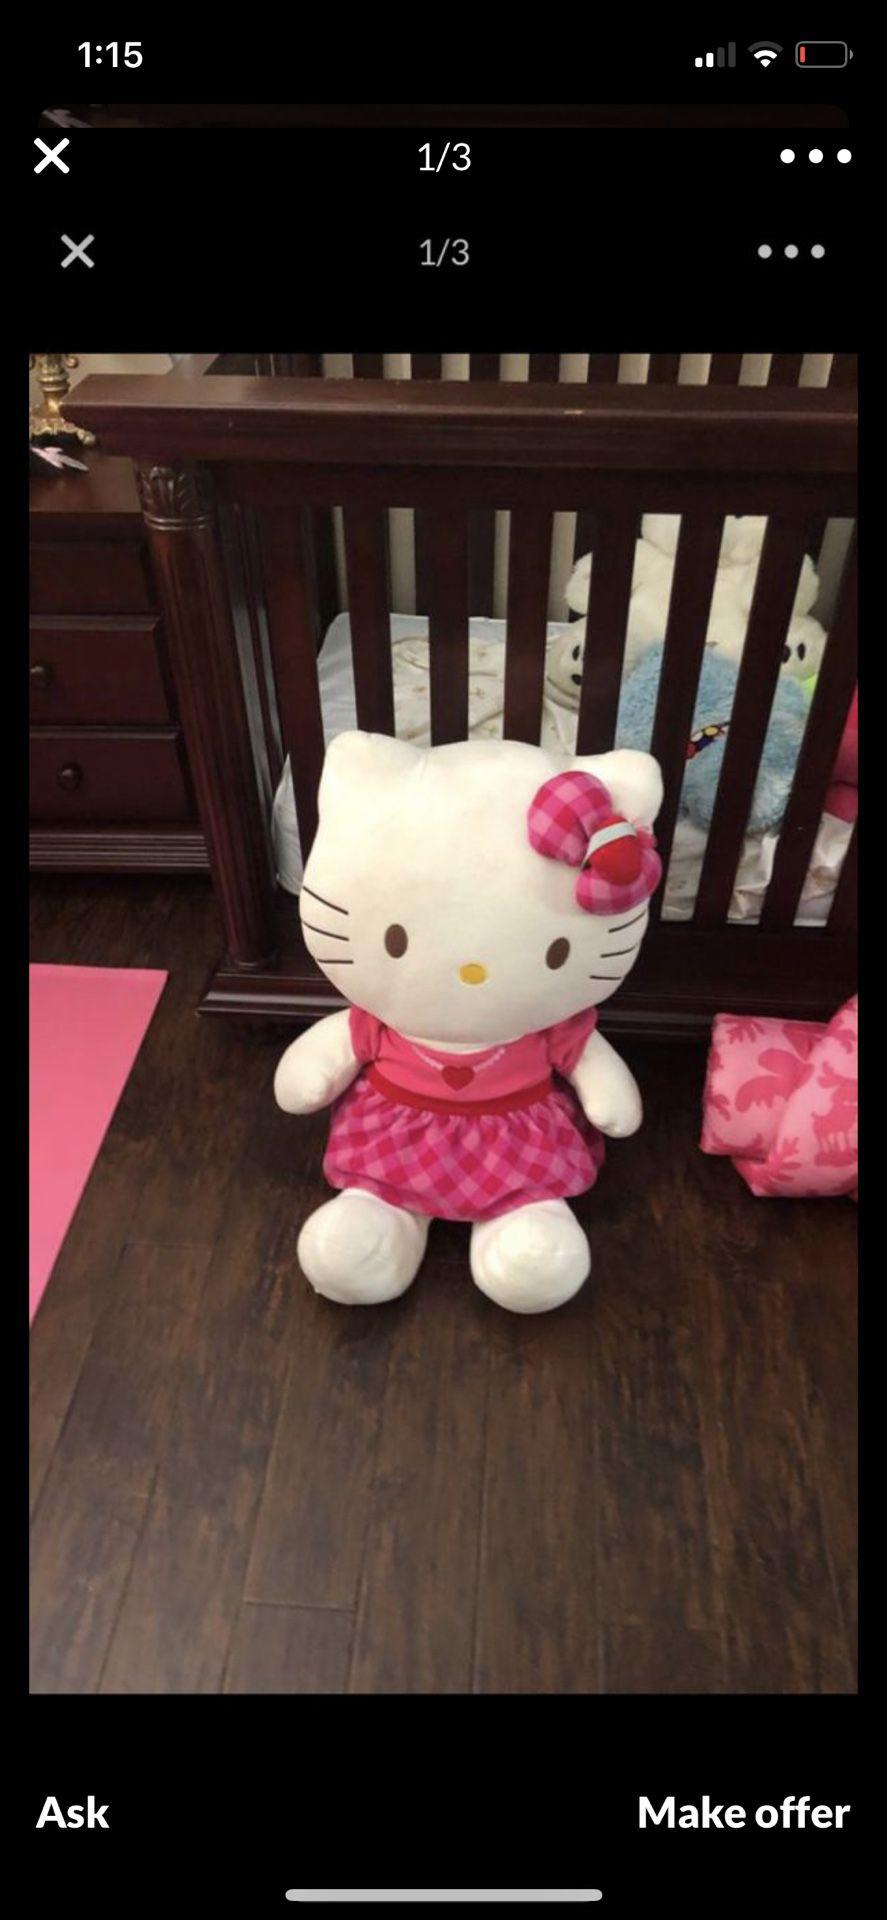 Large hello kitty stuffed character